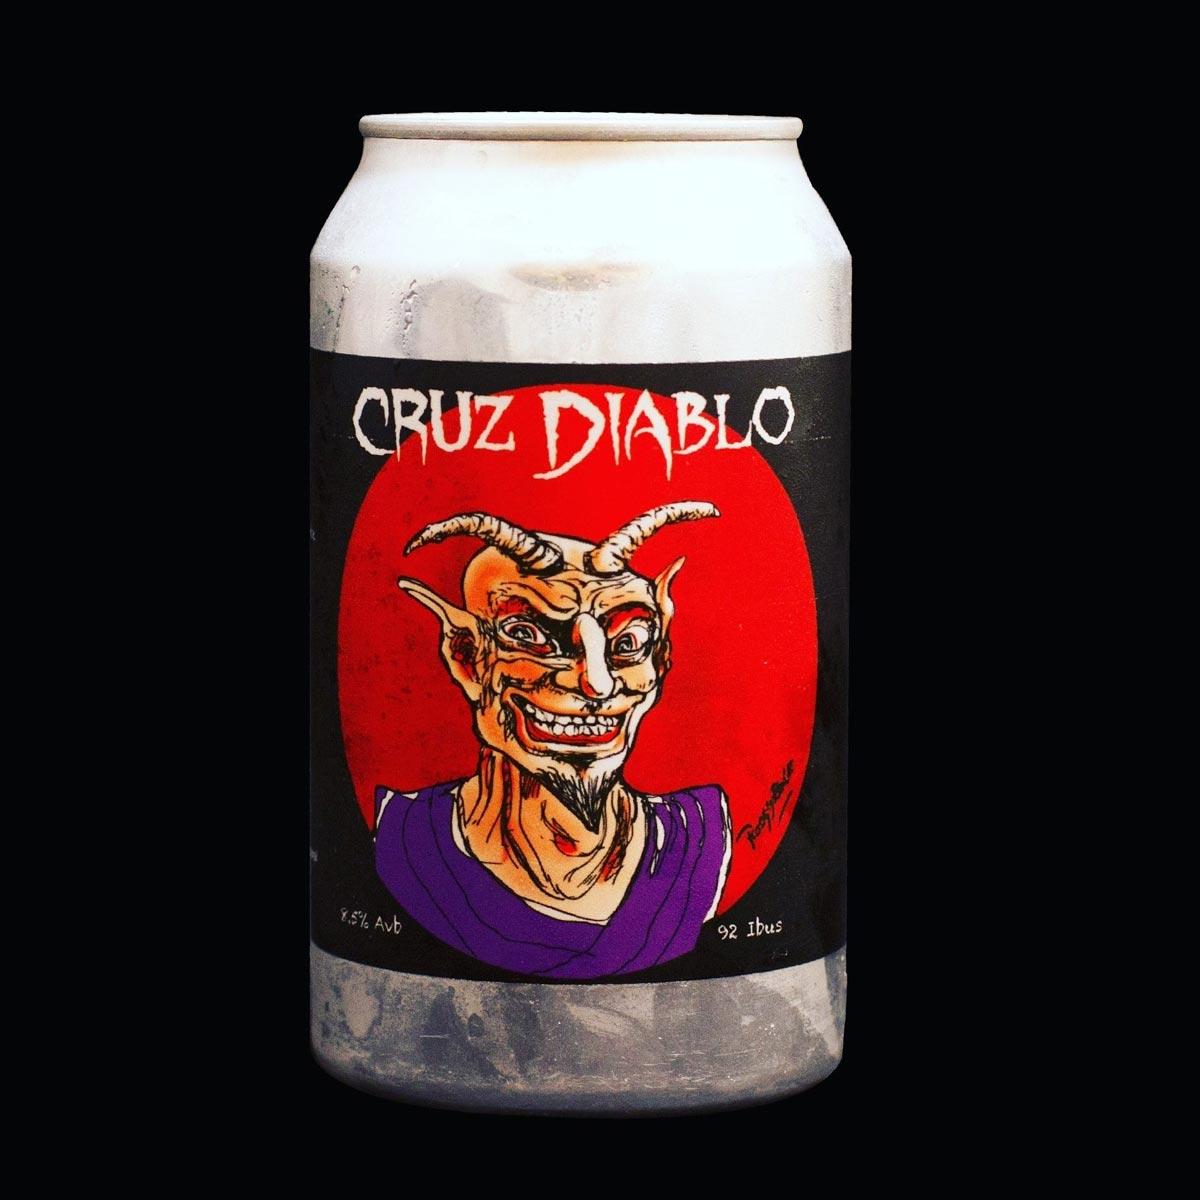 Cerveza artesanal Cruz Diablo de Juguetes Perdidos